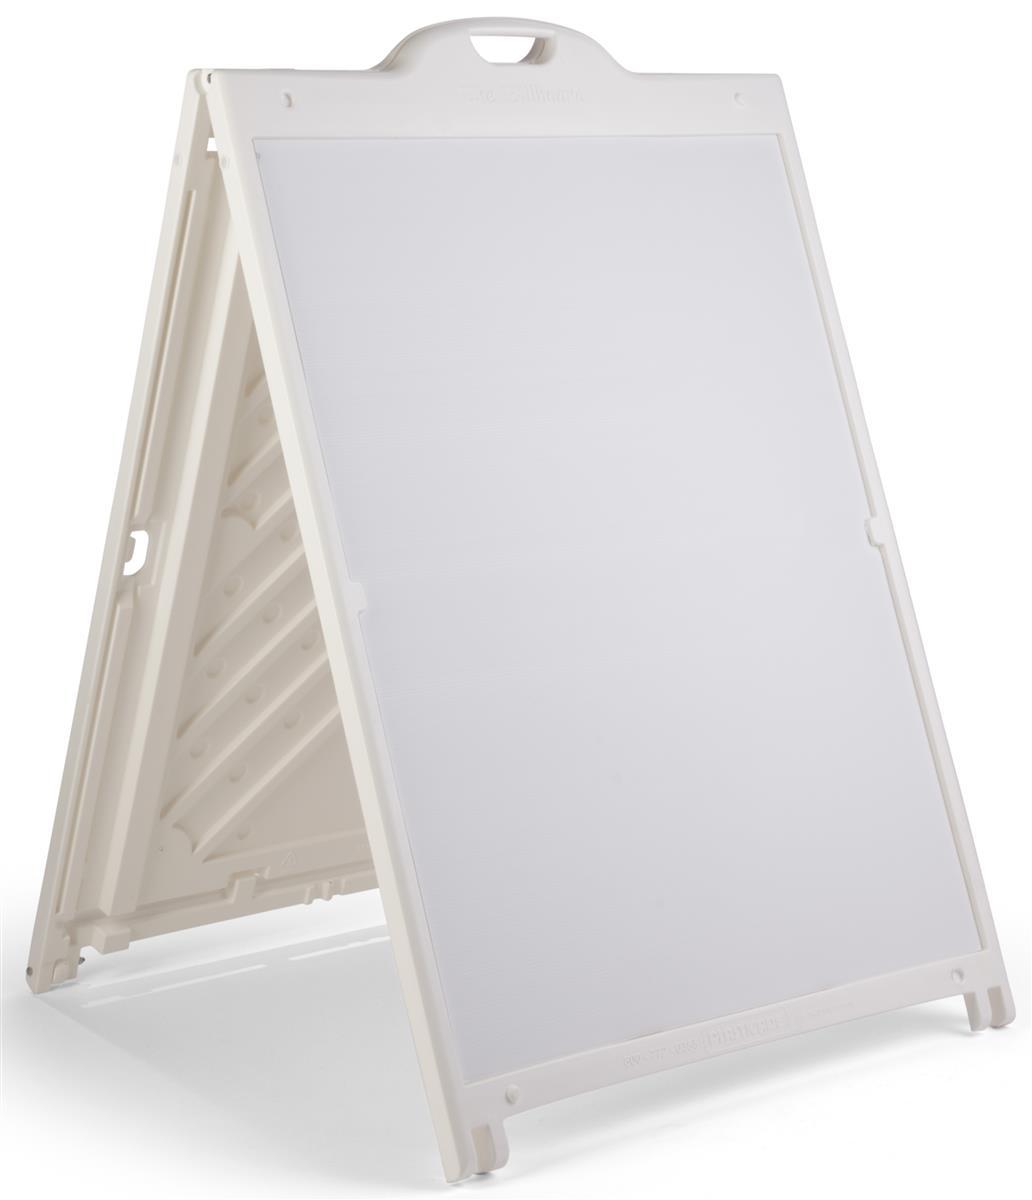 36 x 48 Plastic Sandwich Board | 2 Coroplast® Inserts